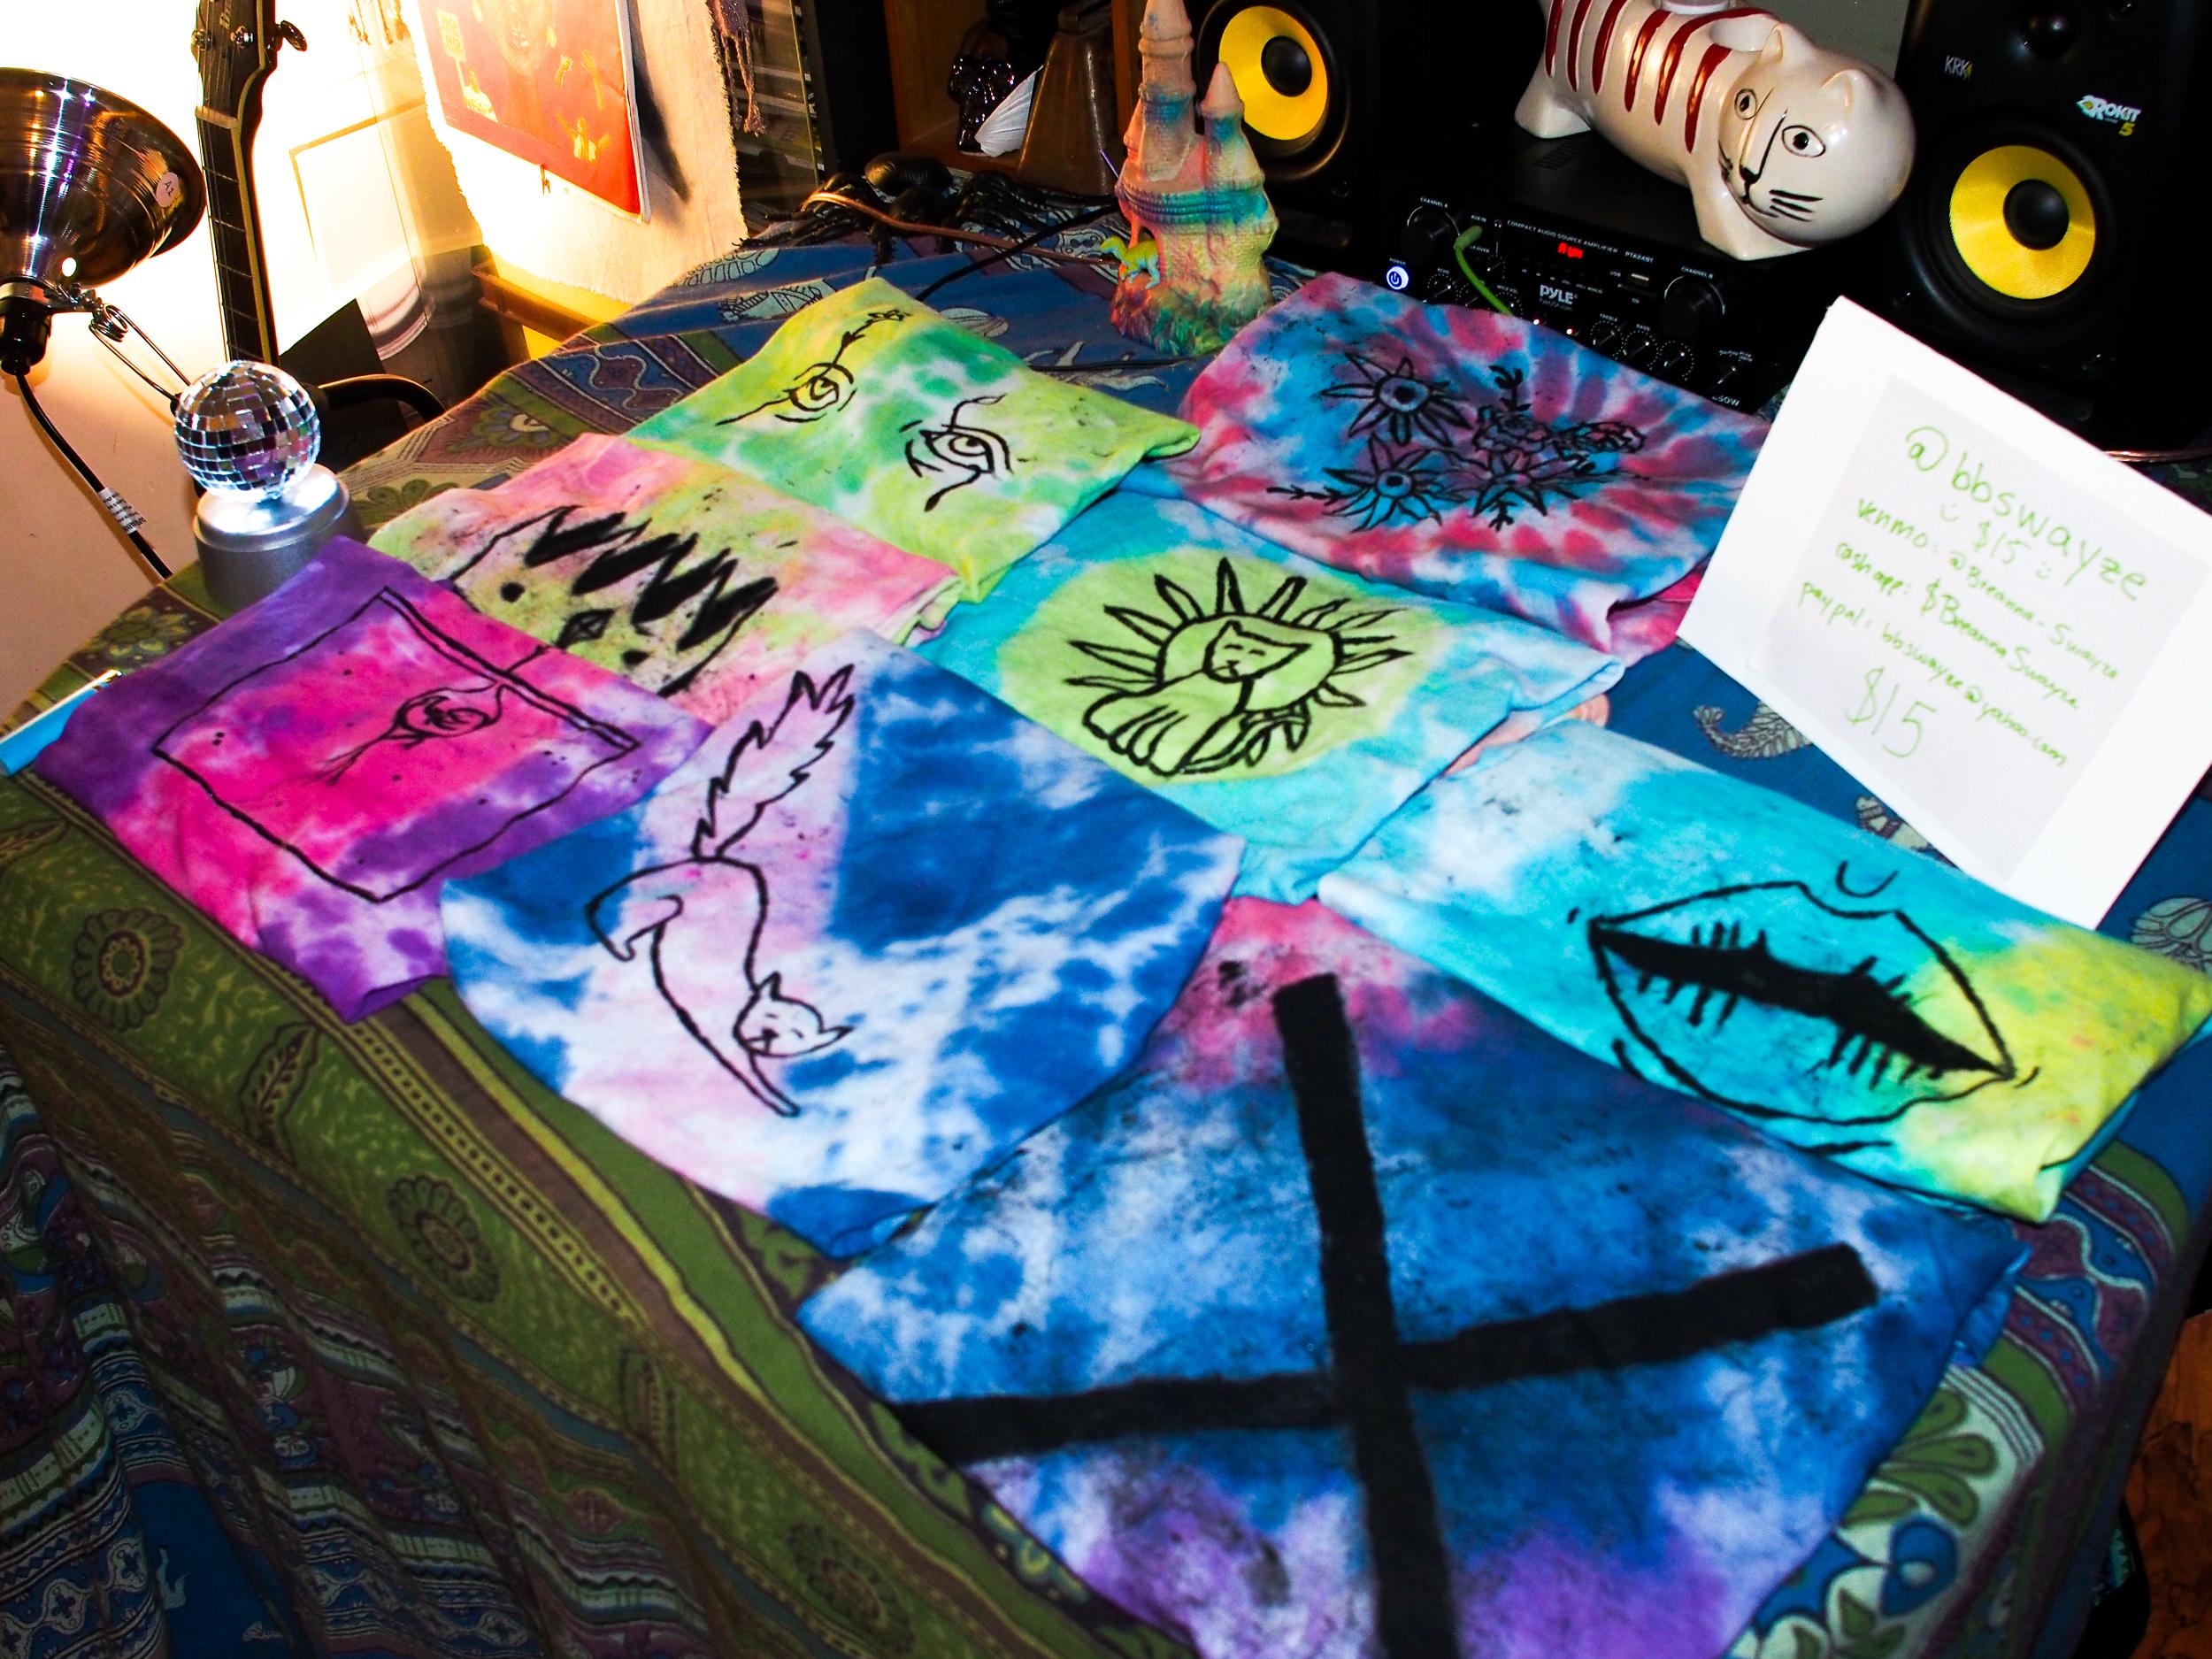 Dope handmade shirts by @bbswayzee